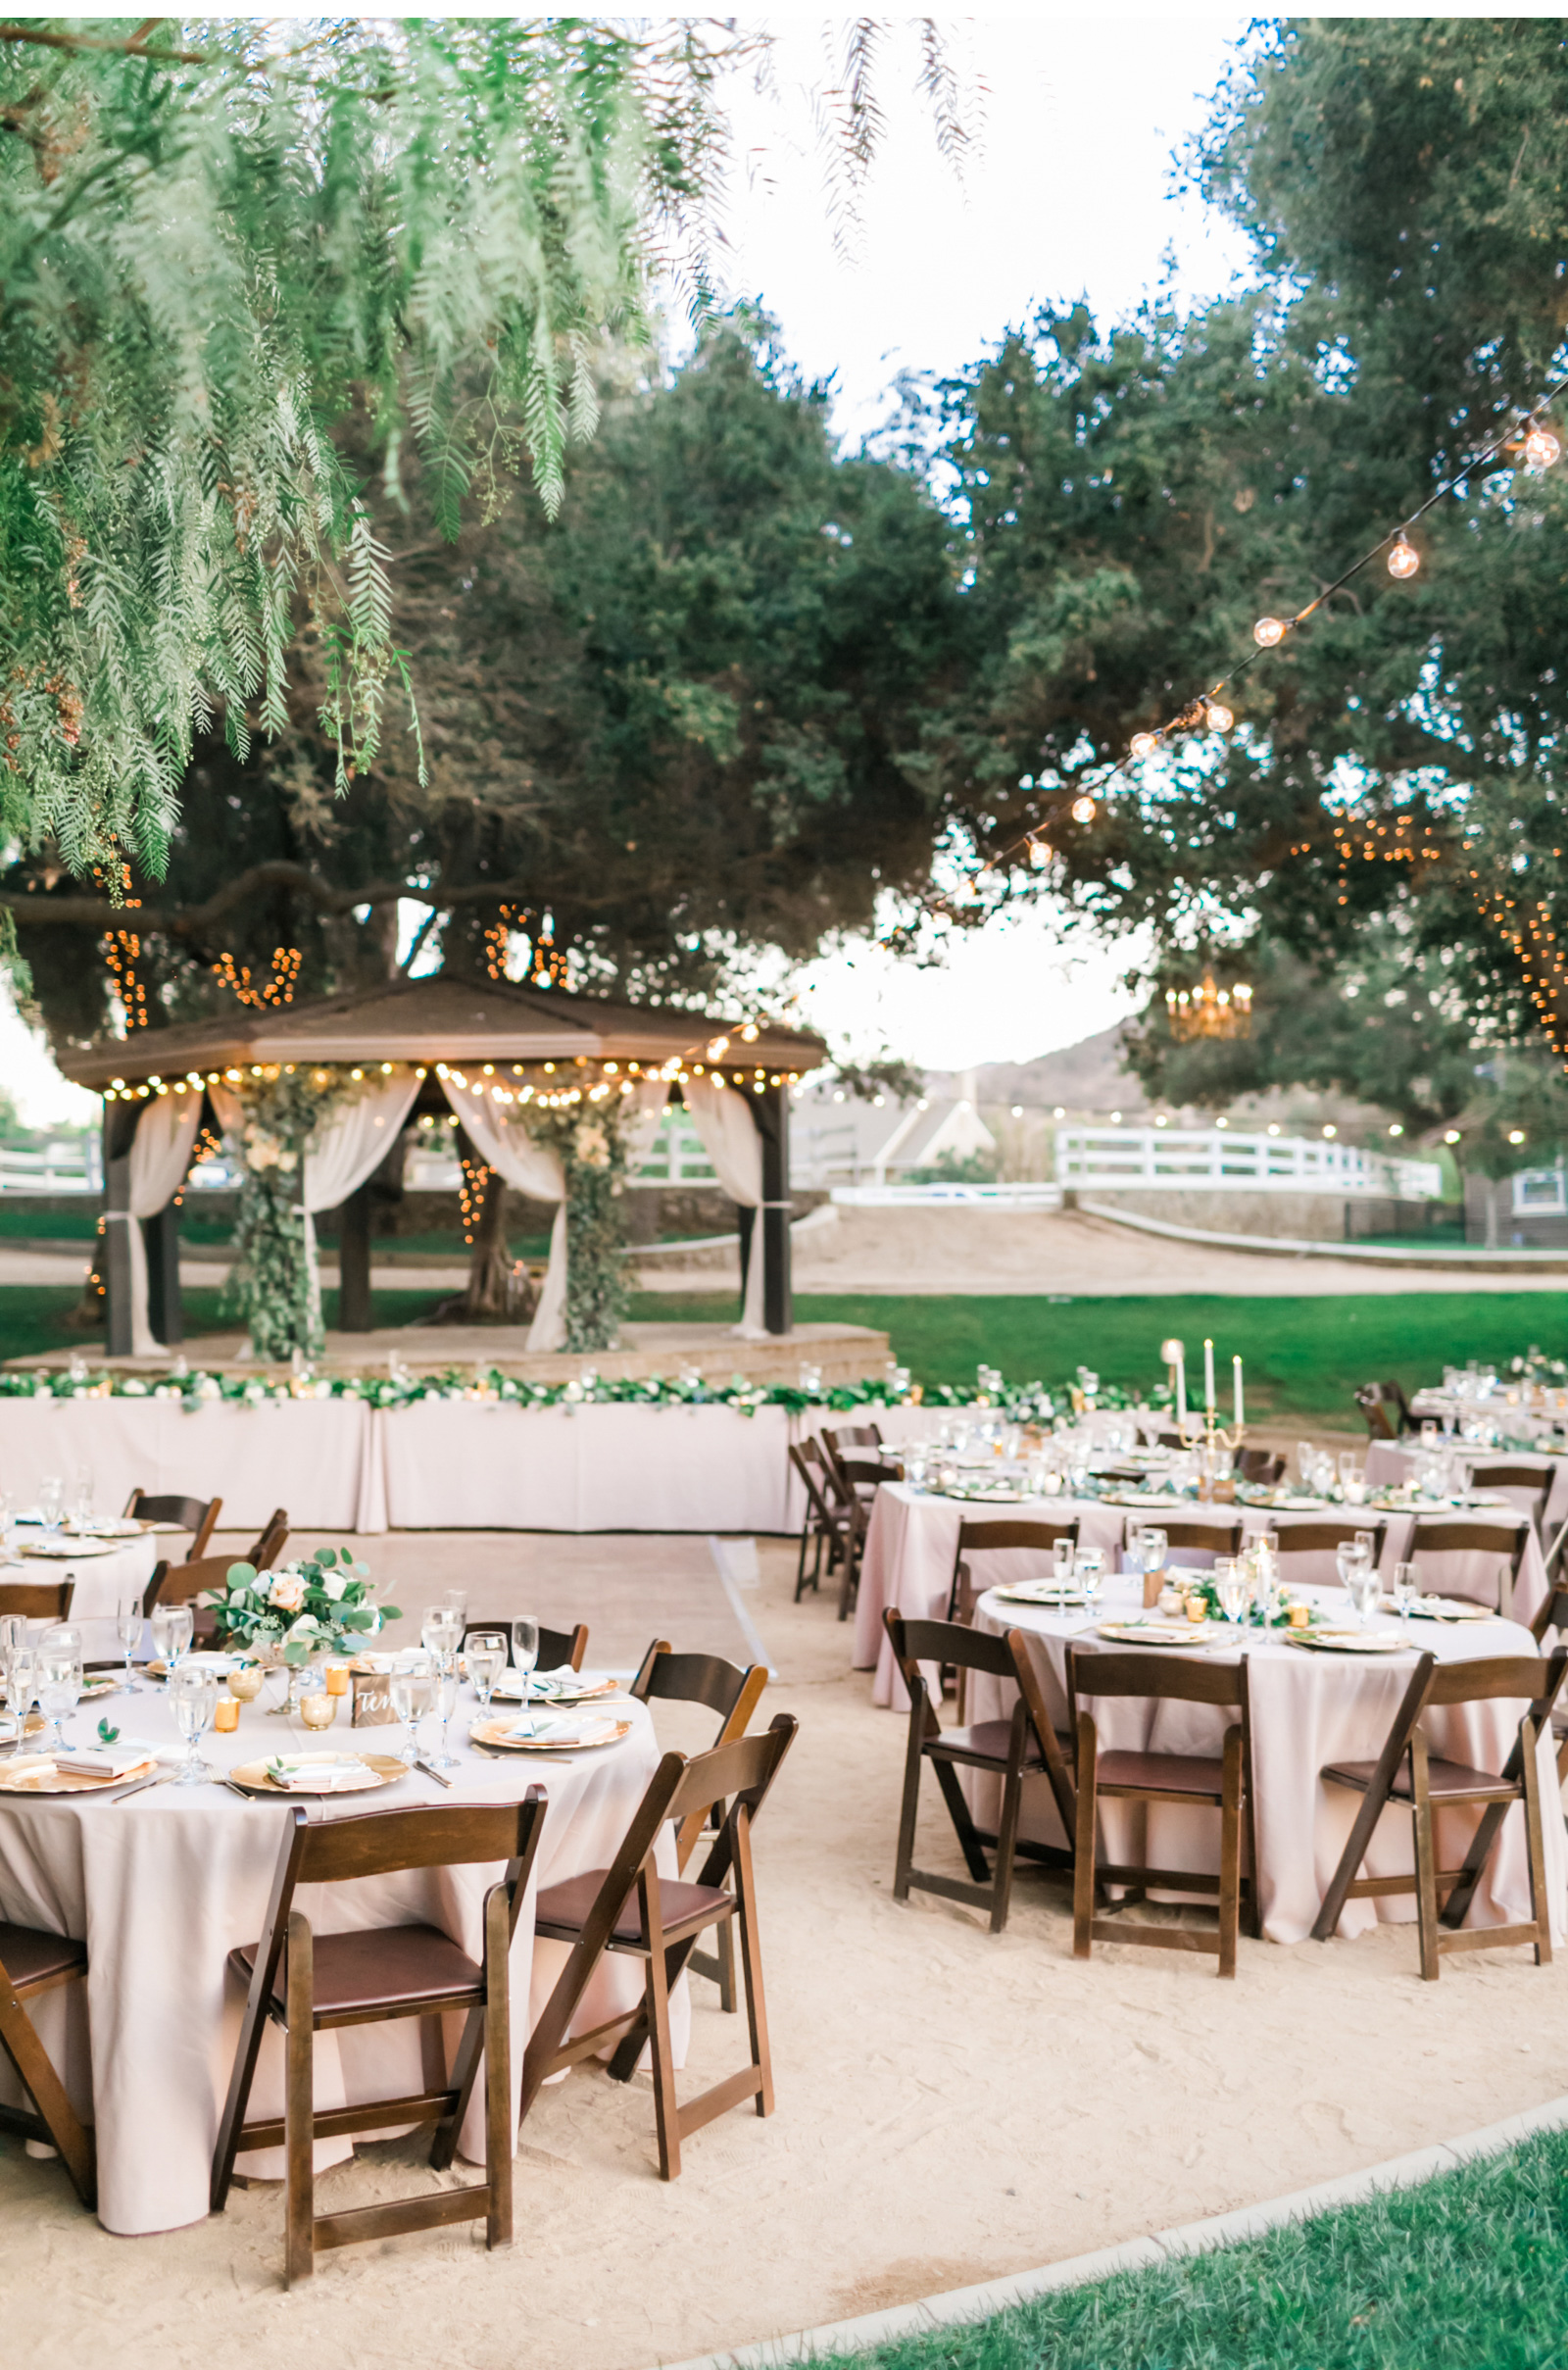 California-Wedding-Photographer-Style-Me-Pretty-Natalie-Schutt-San-Luis-Obispo_13.jpg